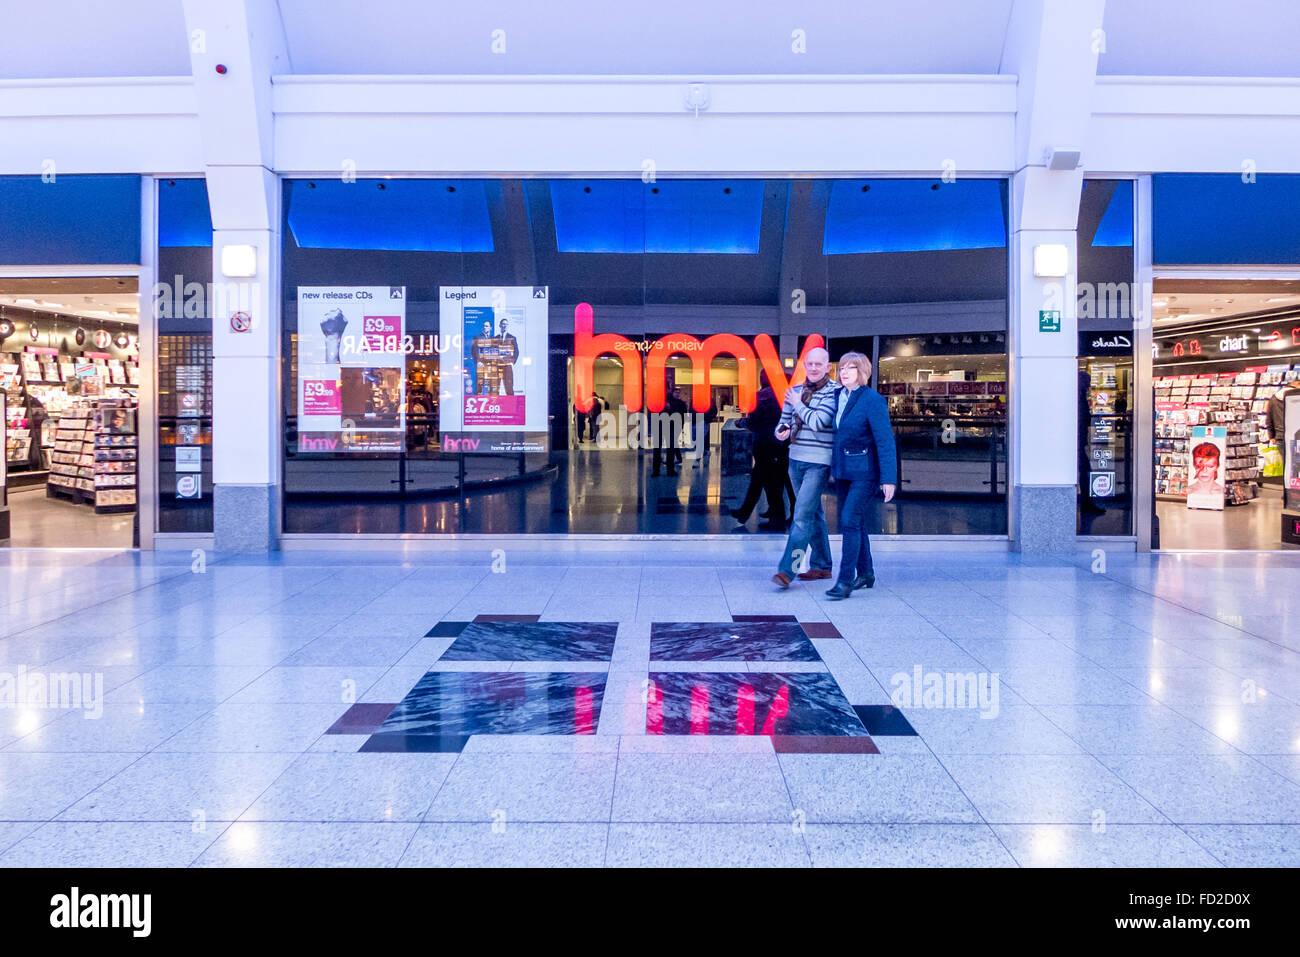 A branch of HMV in Churchill Square shopping mall, Brighton. - Stock Image